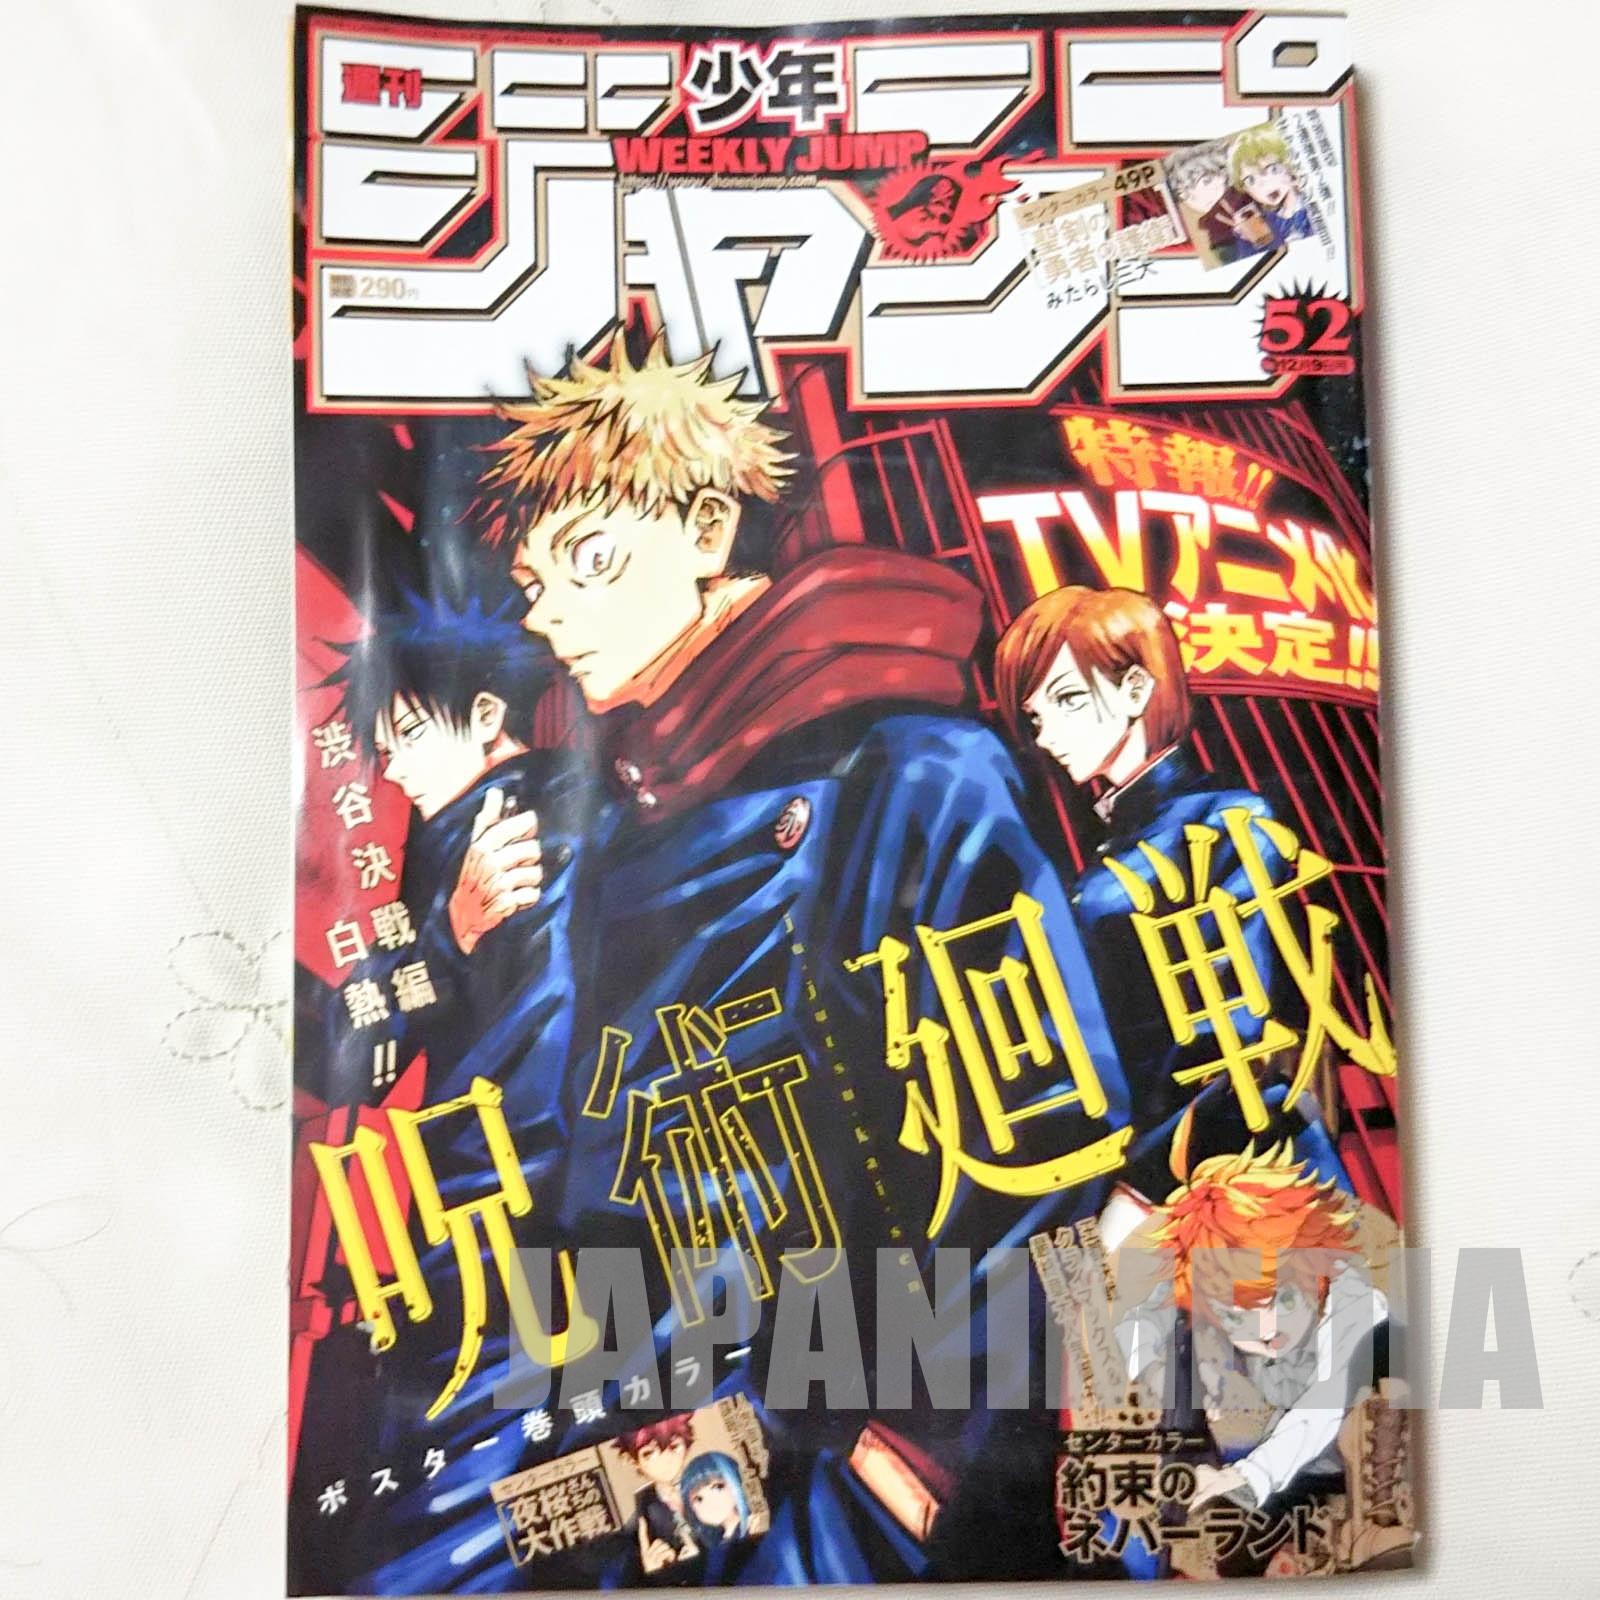 Weekly Shonen JUMP Vol.52 2019 Jujutsu Kaisen / Japanese Magazine JAPAN MANGA